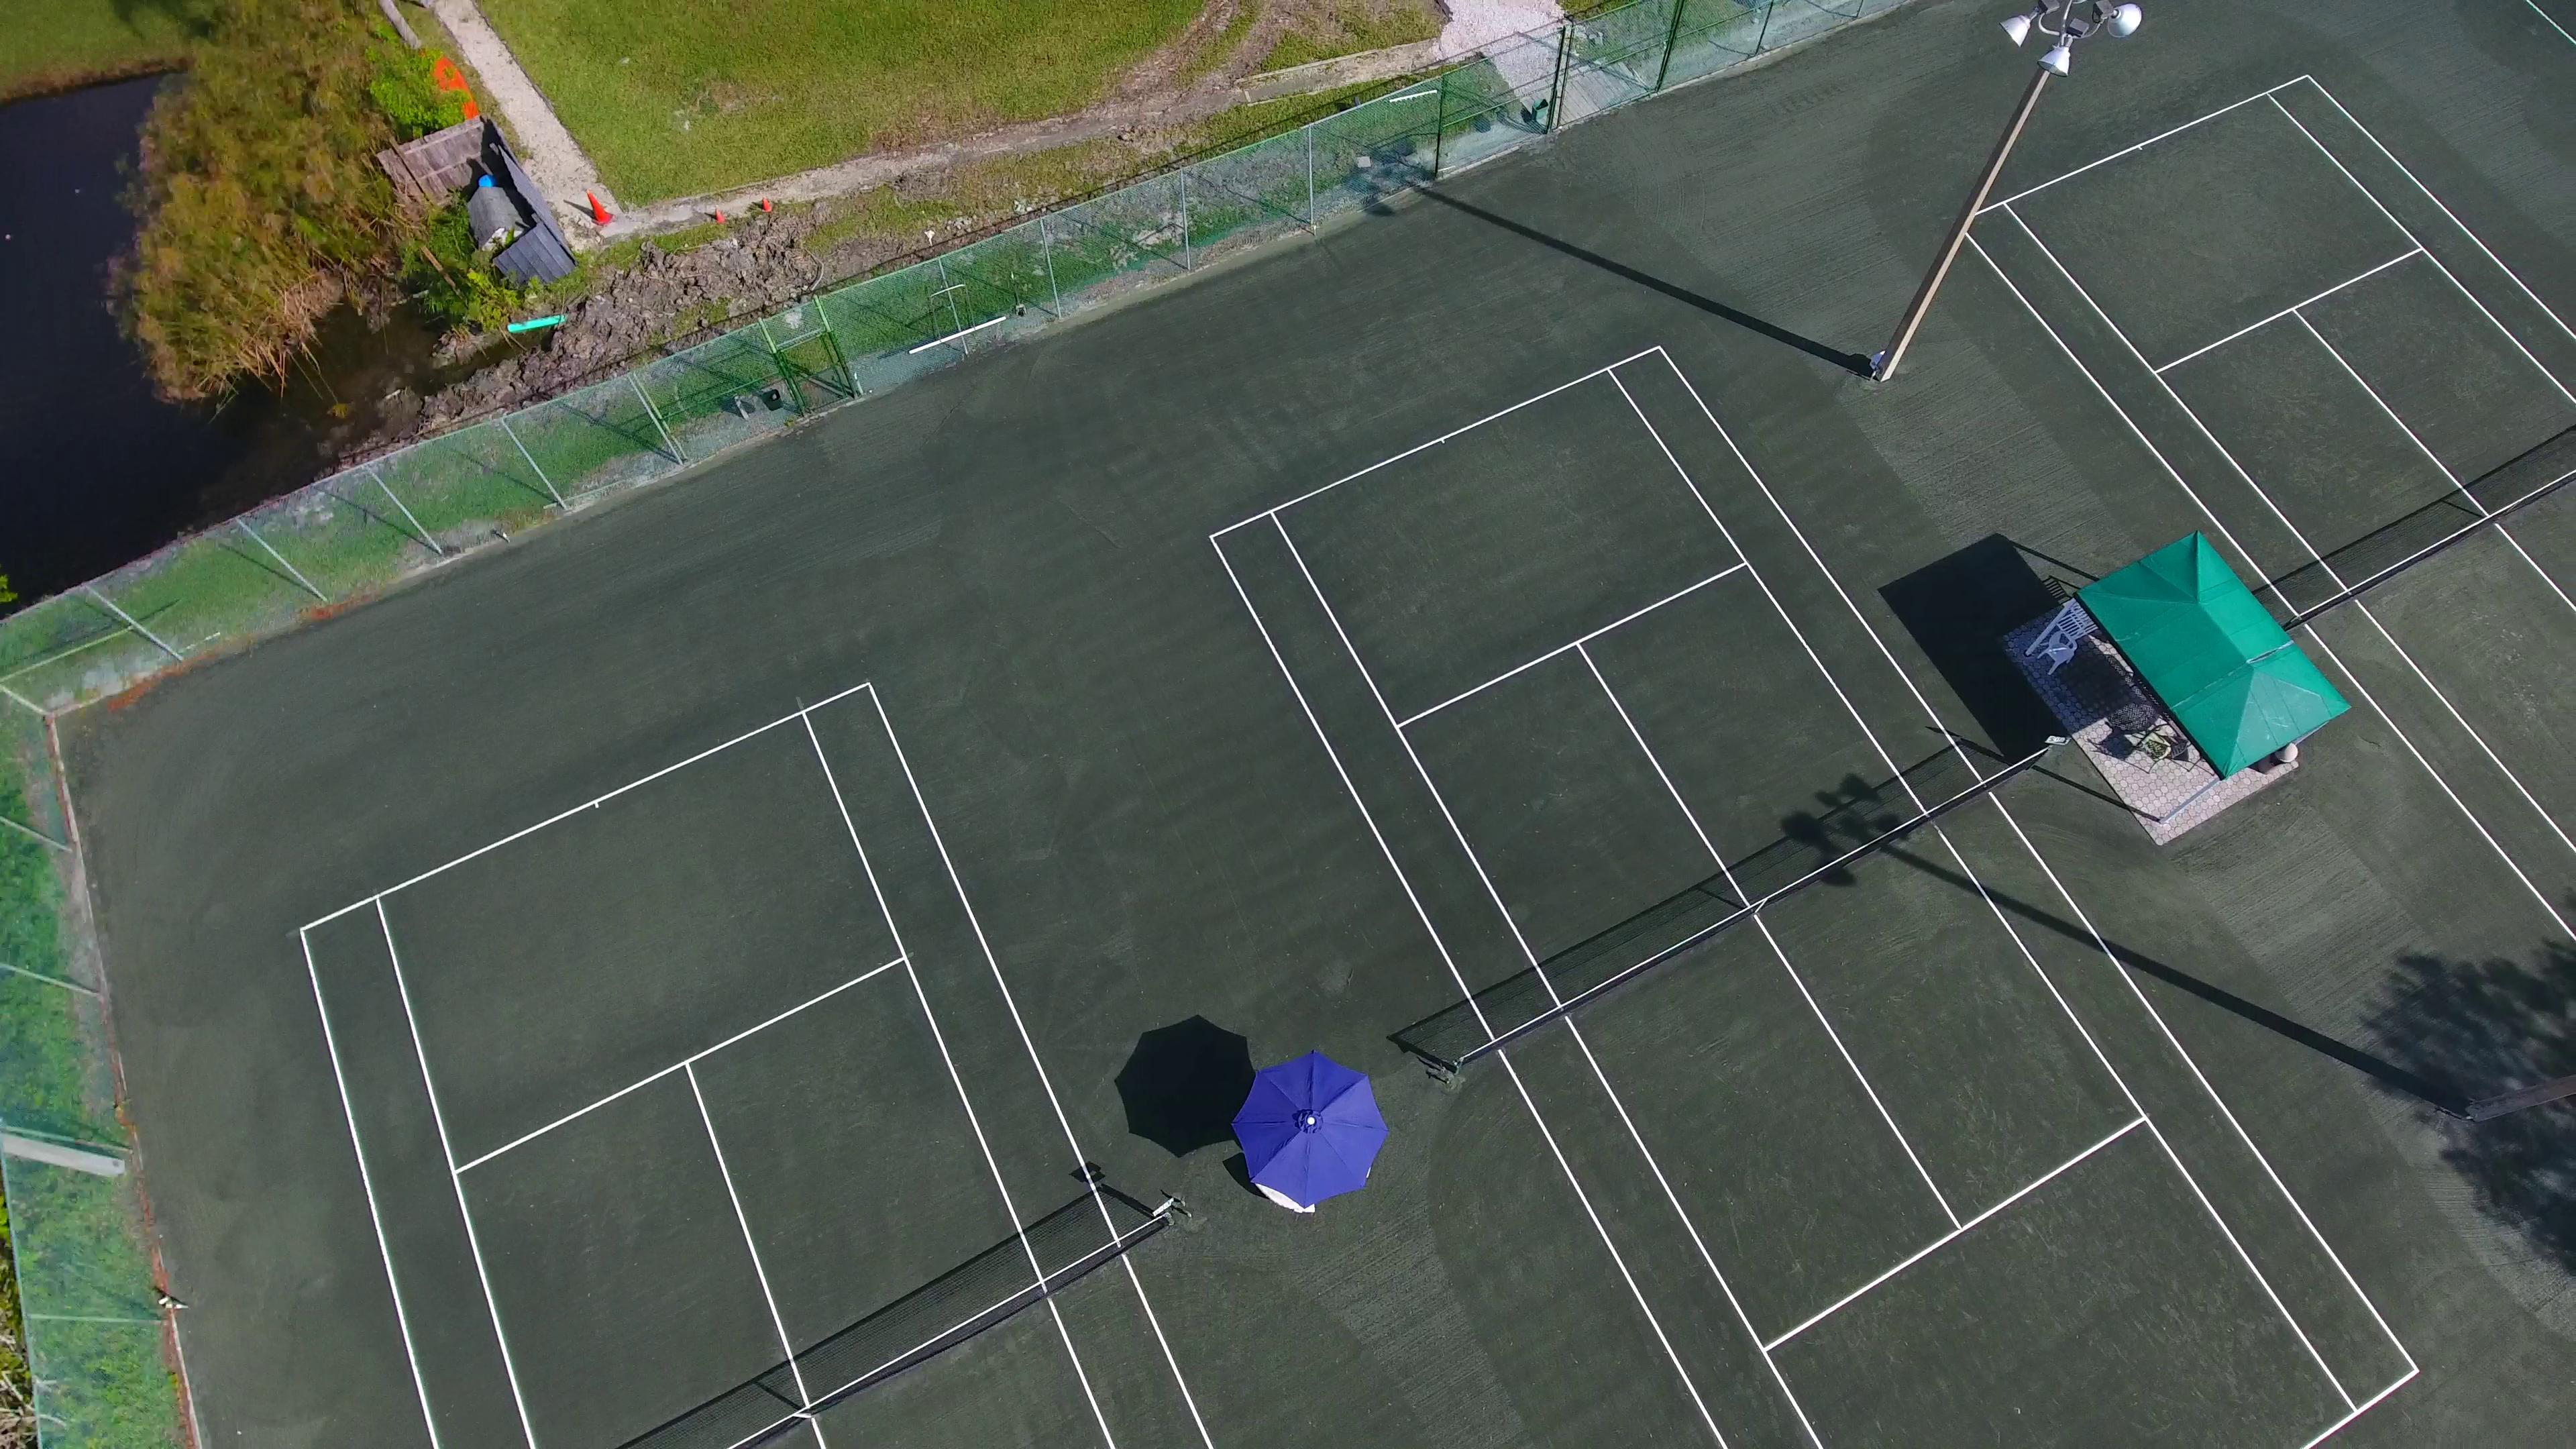 Palmer Tennis Club